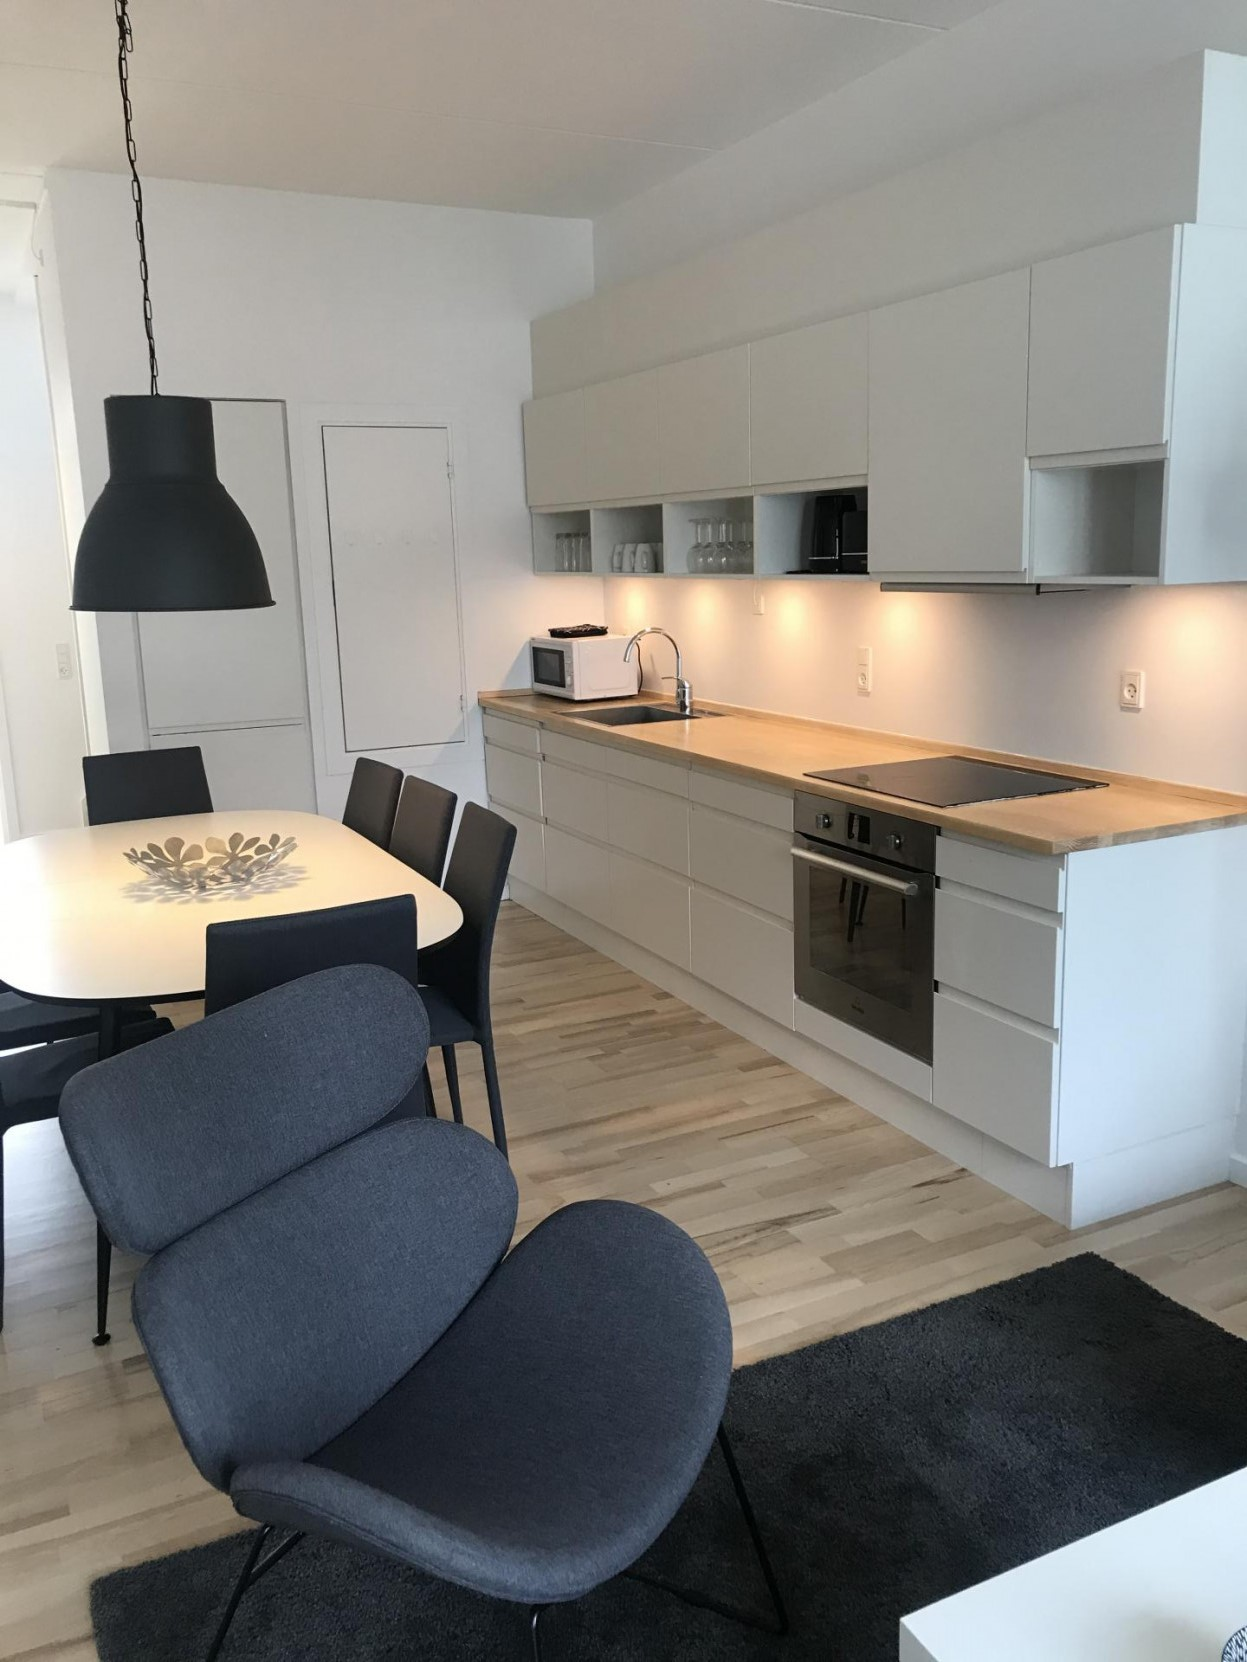 Kitchen at Ben Webster Vej Apartments, Sydhavnen, Copenhagen